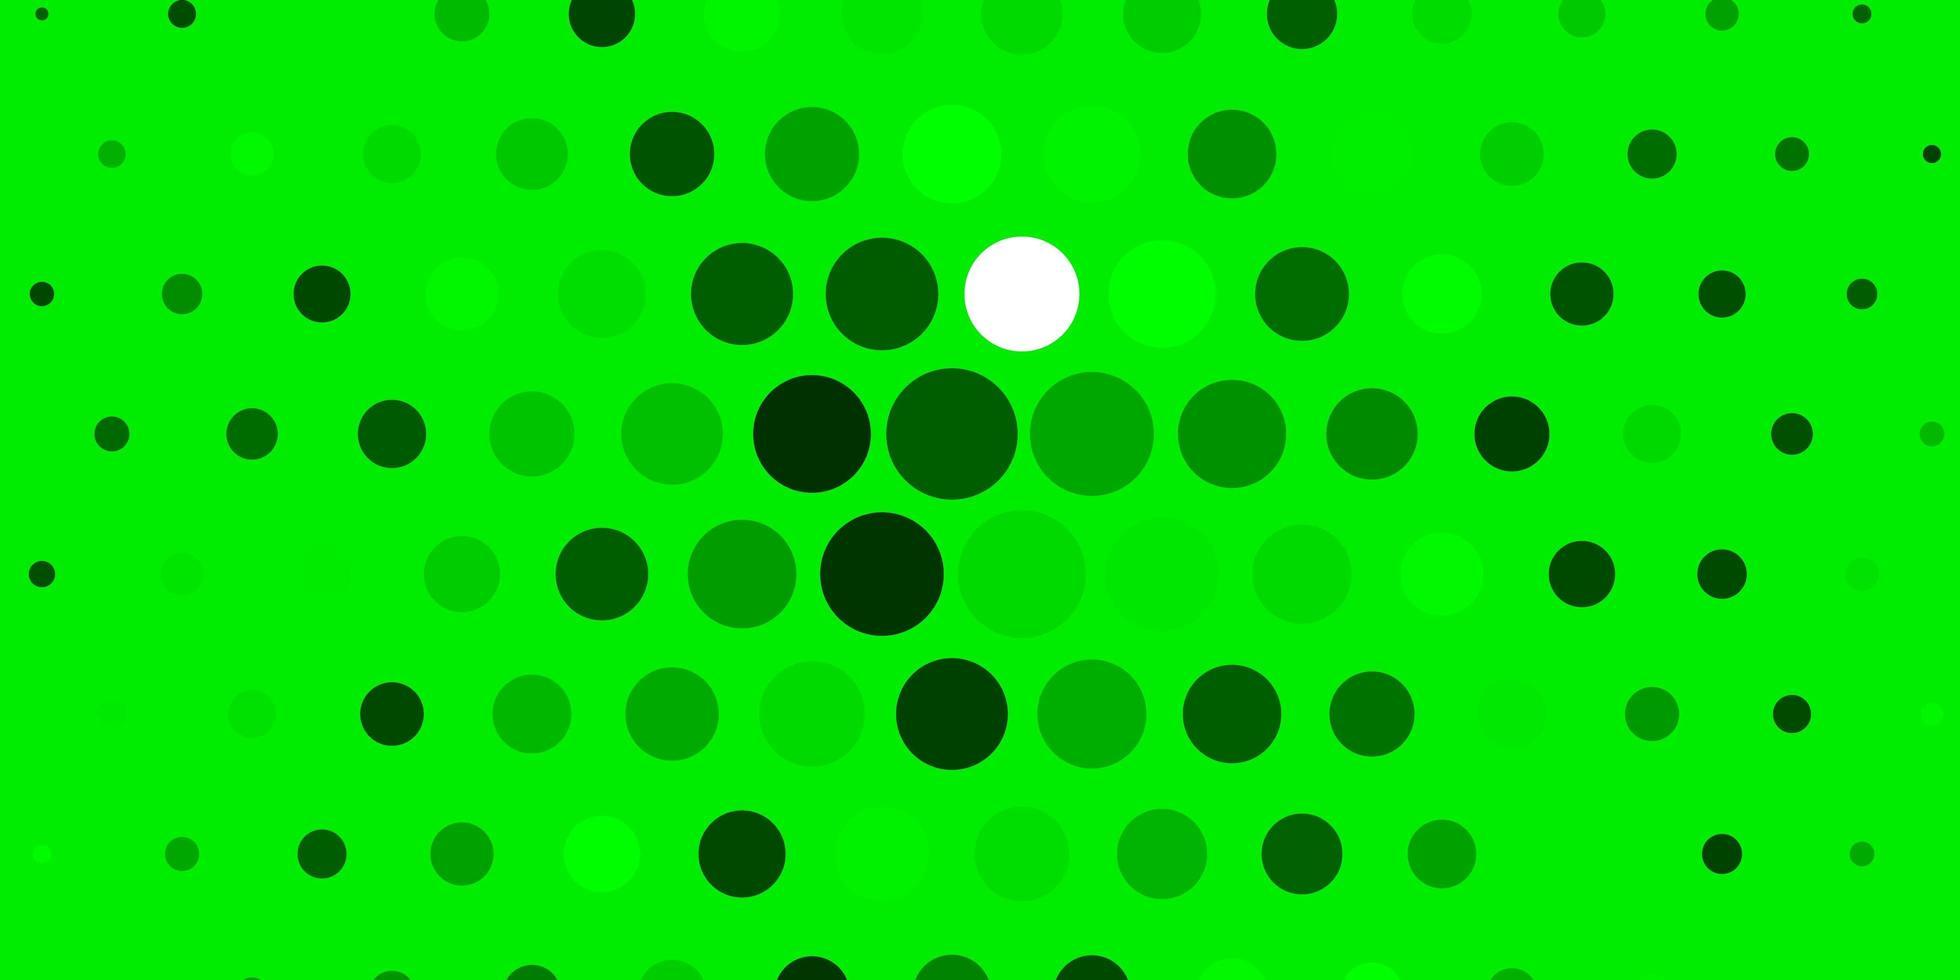 fundo verde claro com círculos. vetor